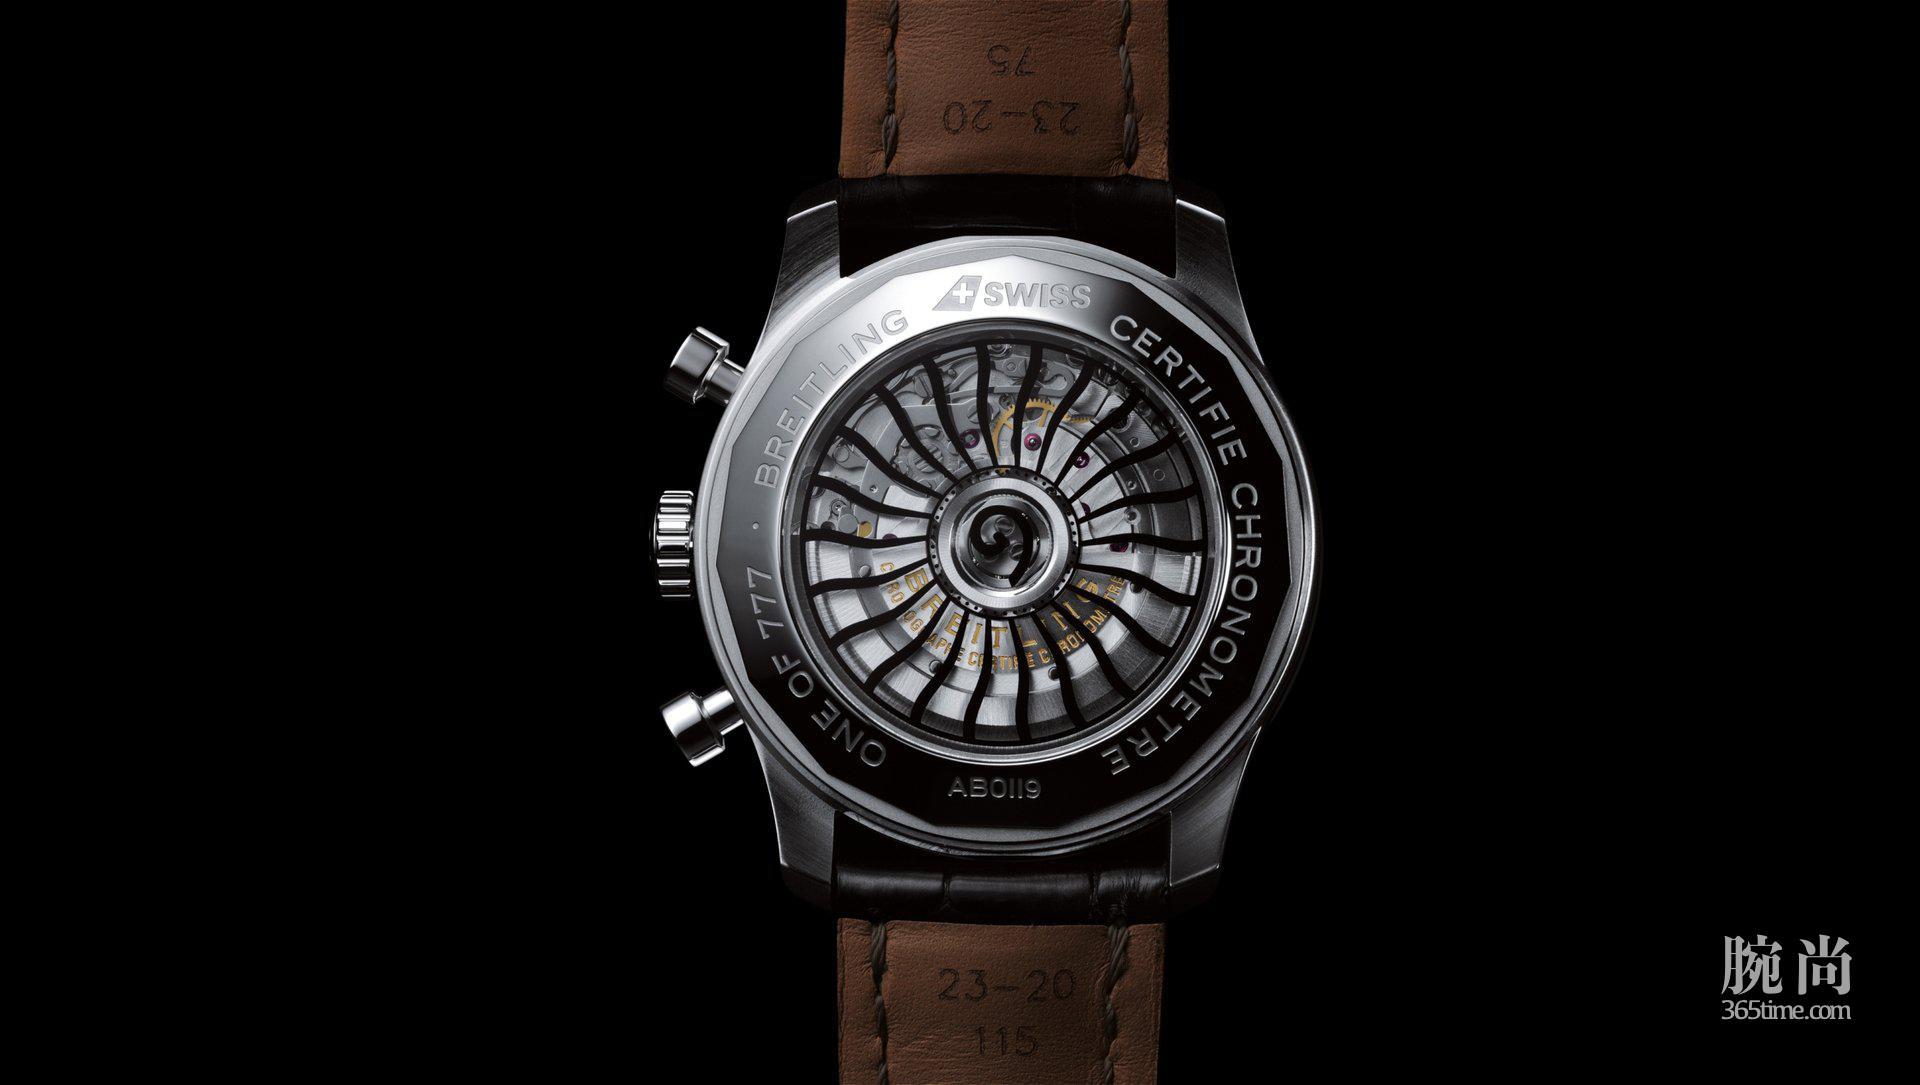 03_navitimer-aviator-8-b01-chronograph-43-swiss-limited-edition_20439_b.jpg